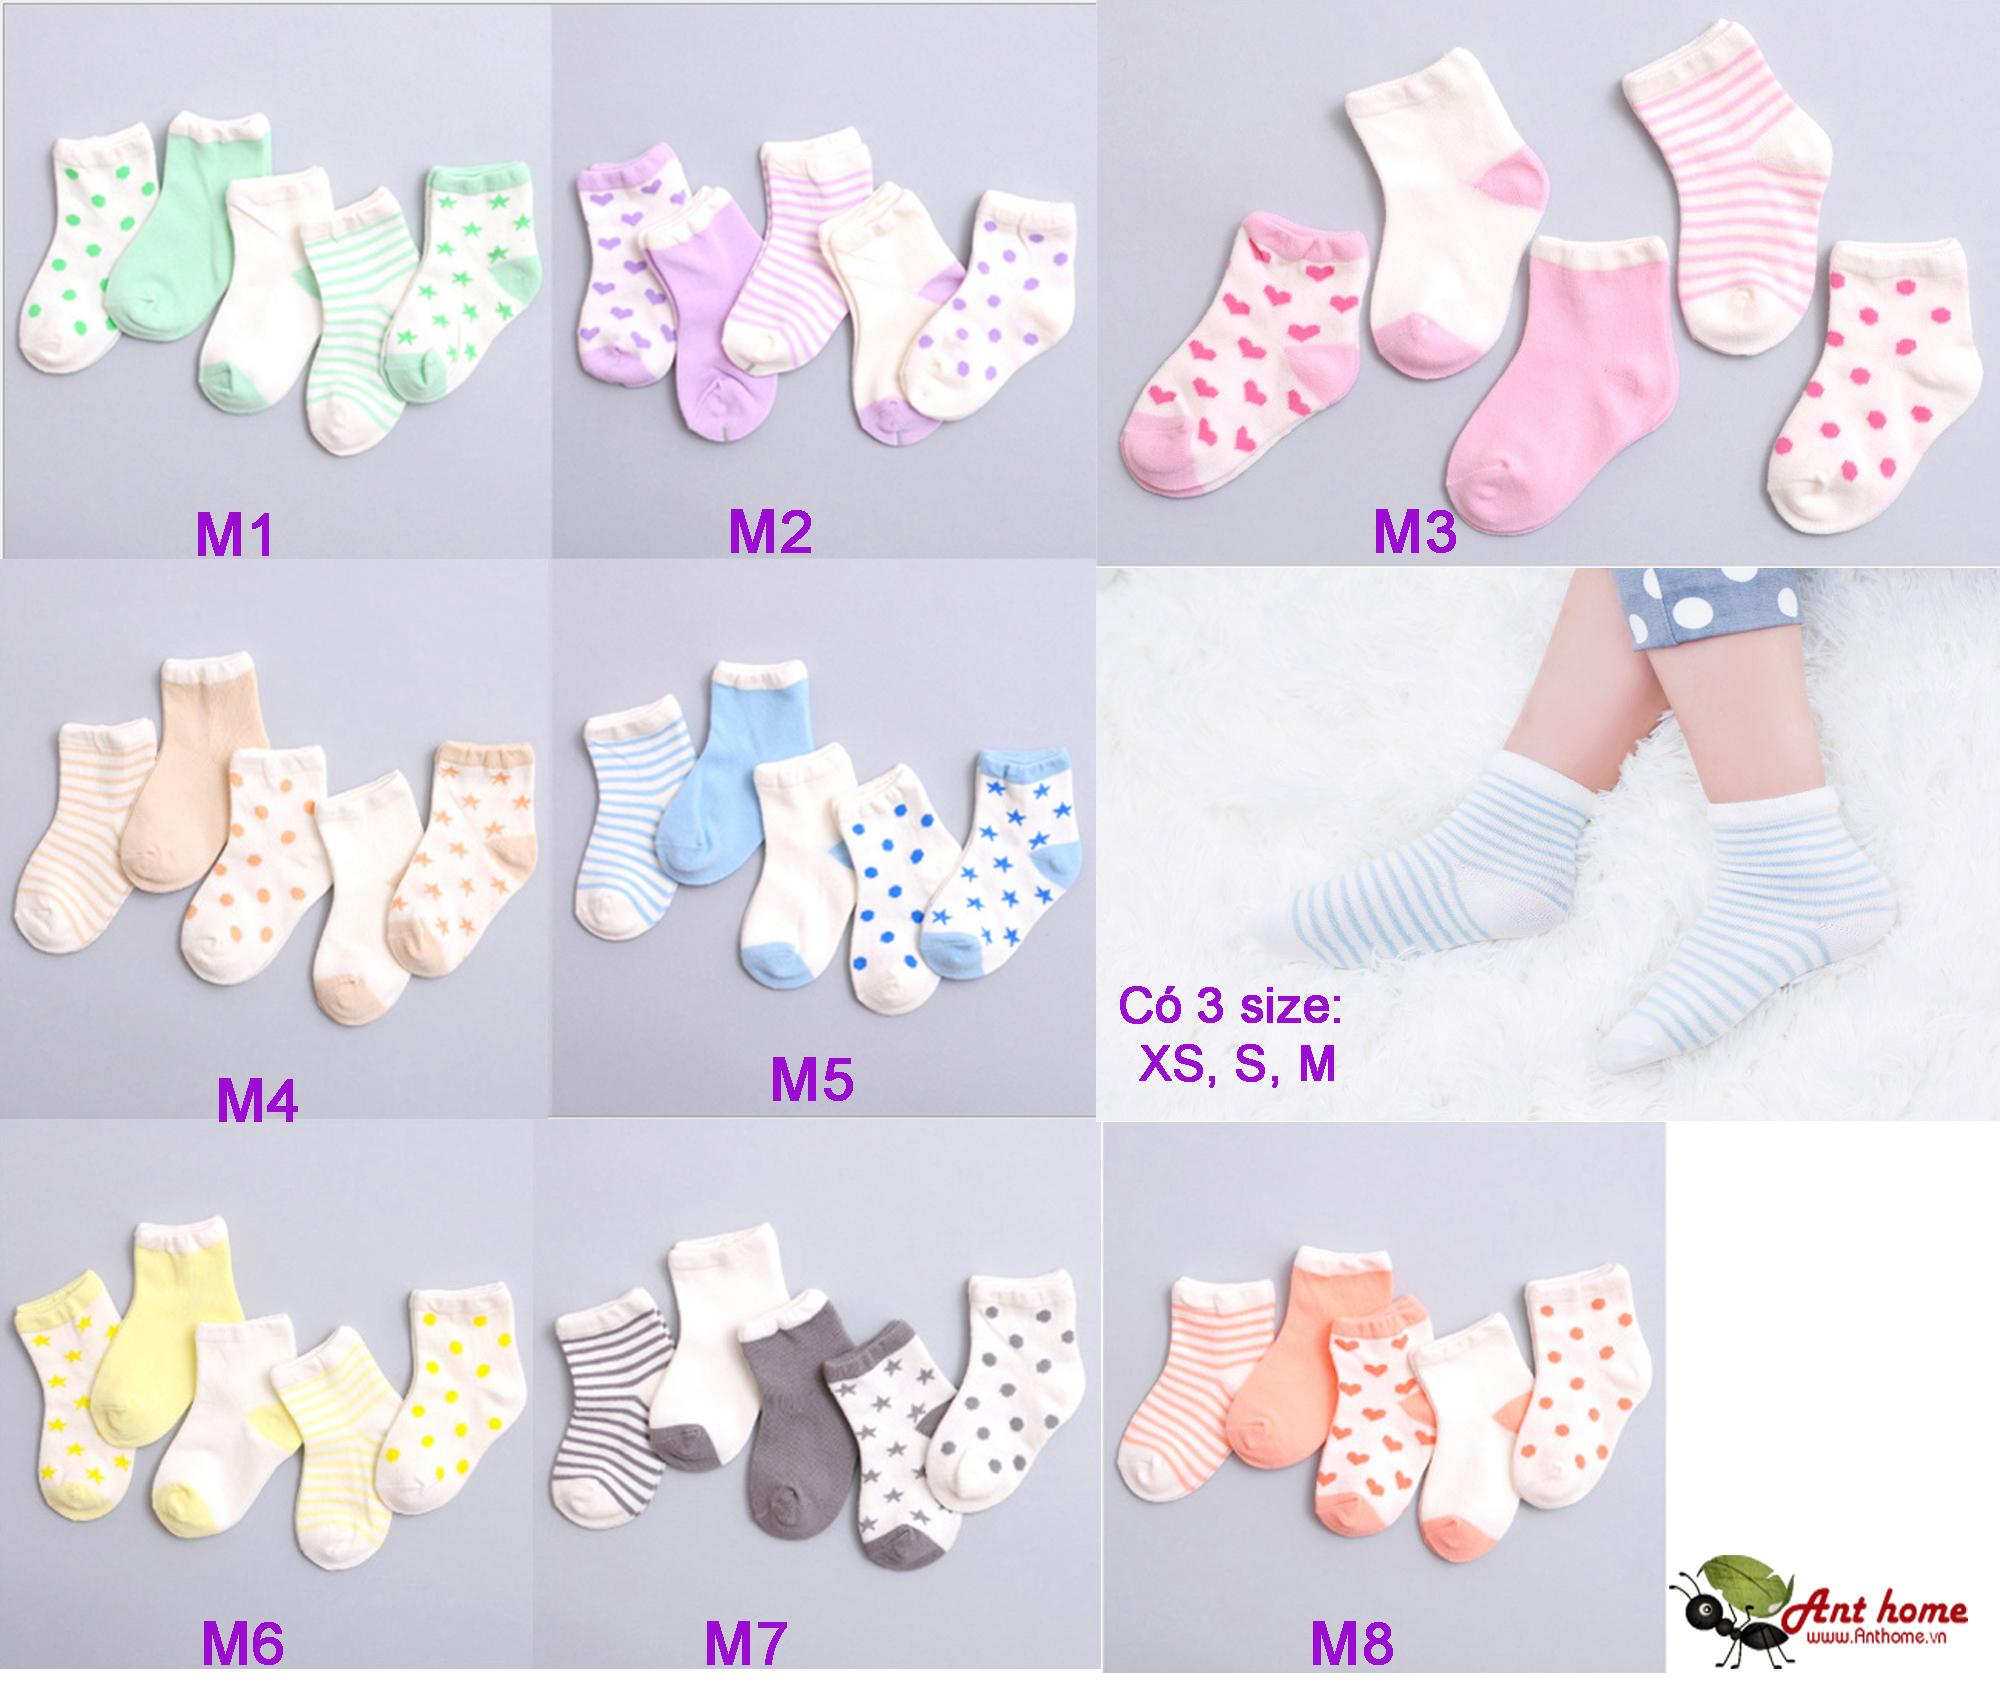 Combo 5 đôi vớ (tất) bé gái từ 0-1 tuổi size XS mẫu M5